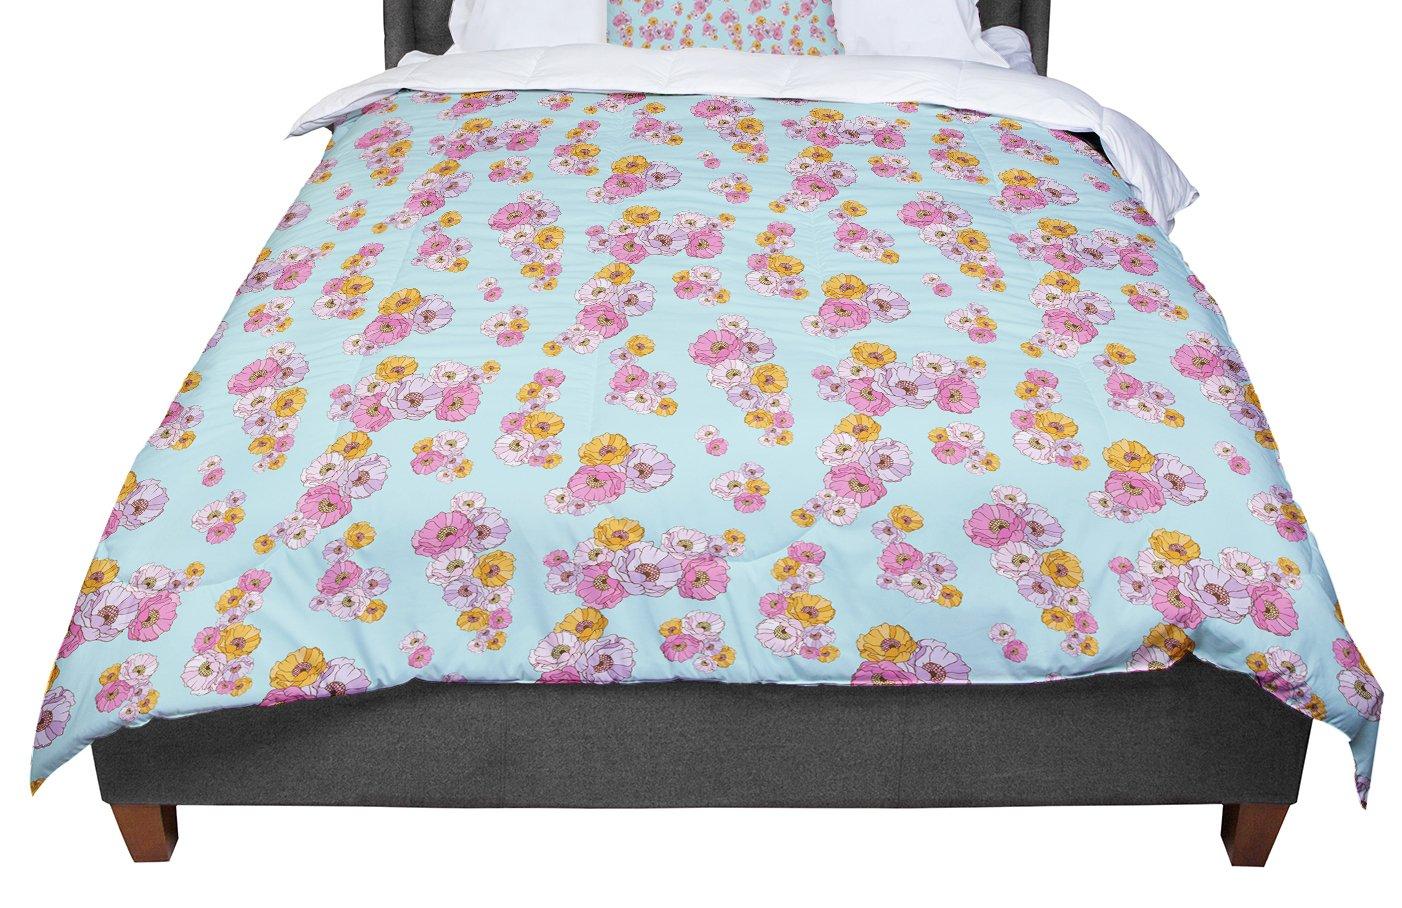 104 X 88 Cal King Comforter KESS InHouse Laura Escalante Paper Flower King